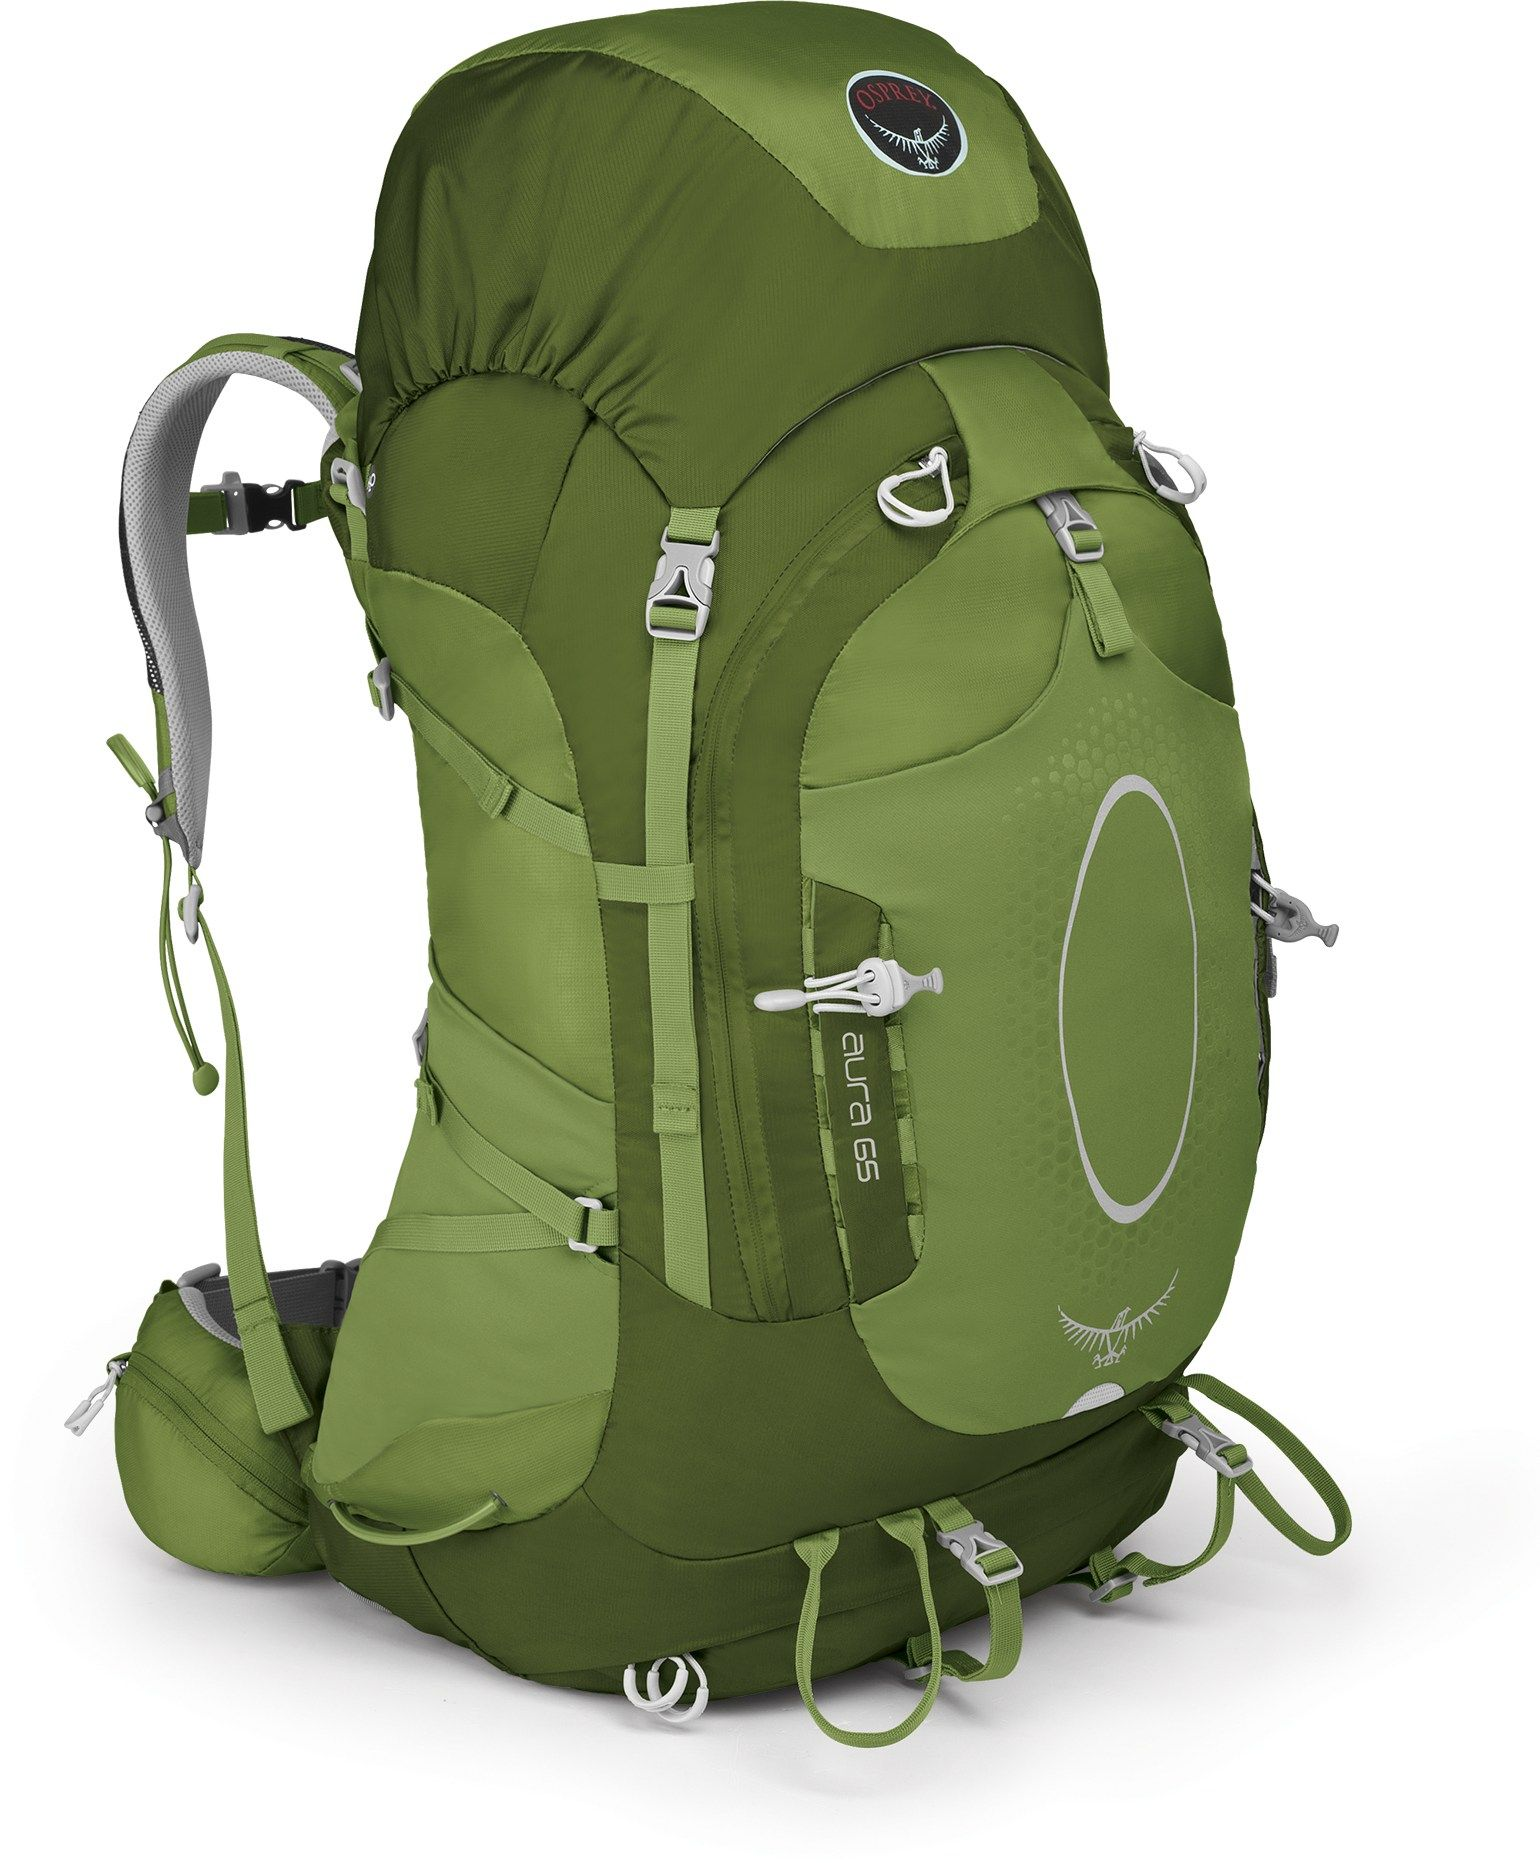 Osprey Aura 65 Pack Women S Osprey Backpacks Osprey Atmos Osprey Packs